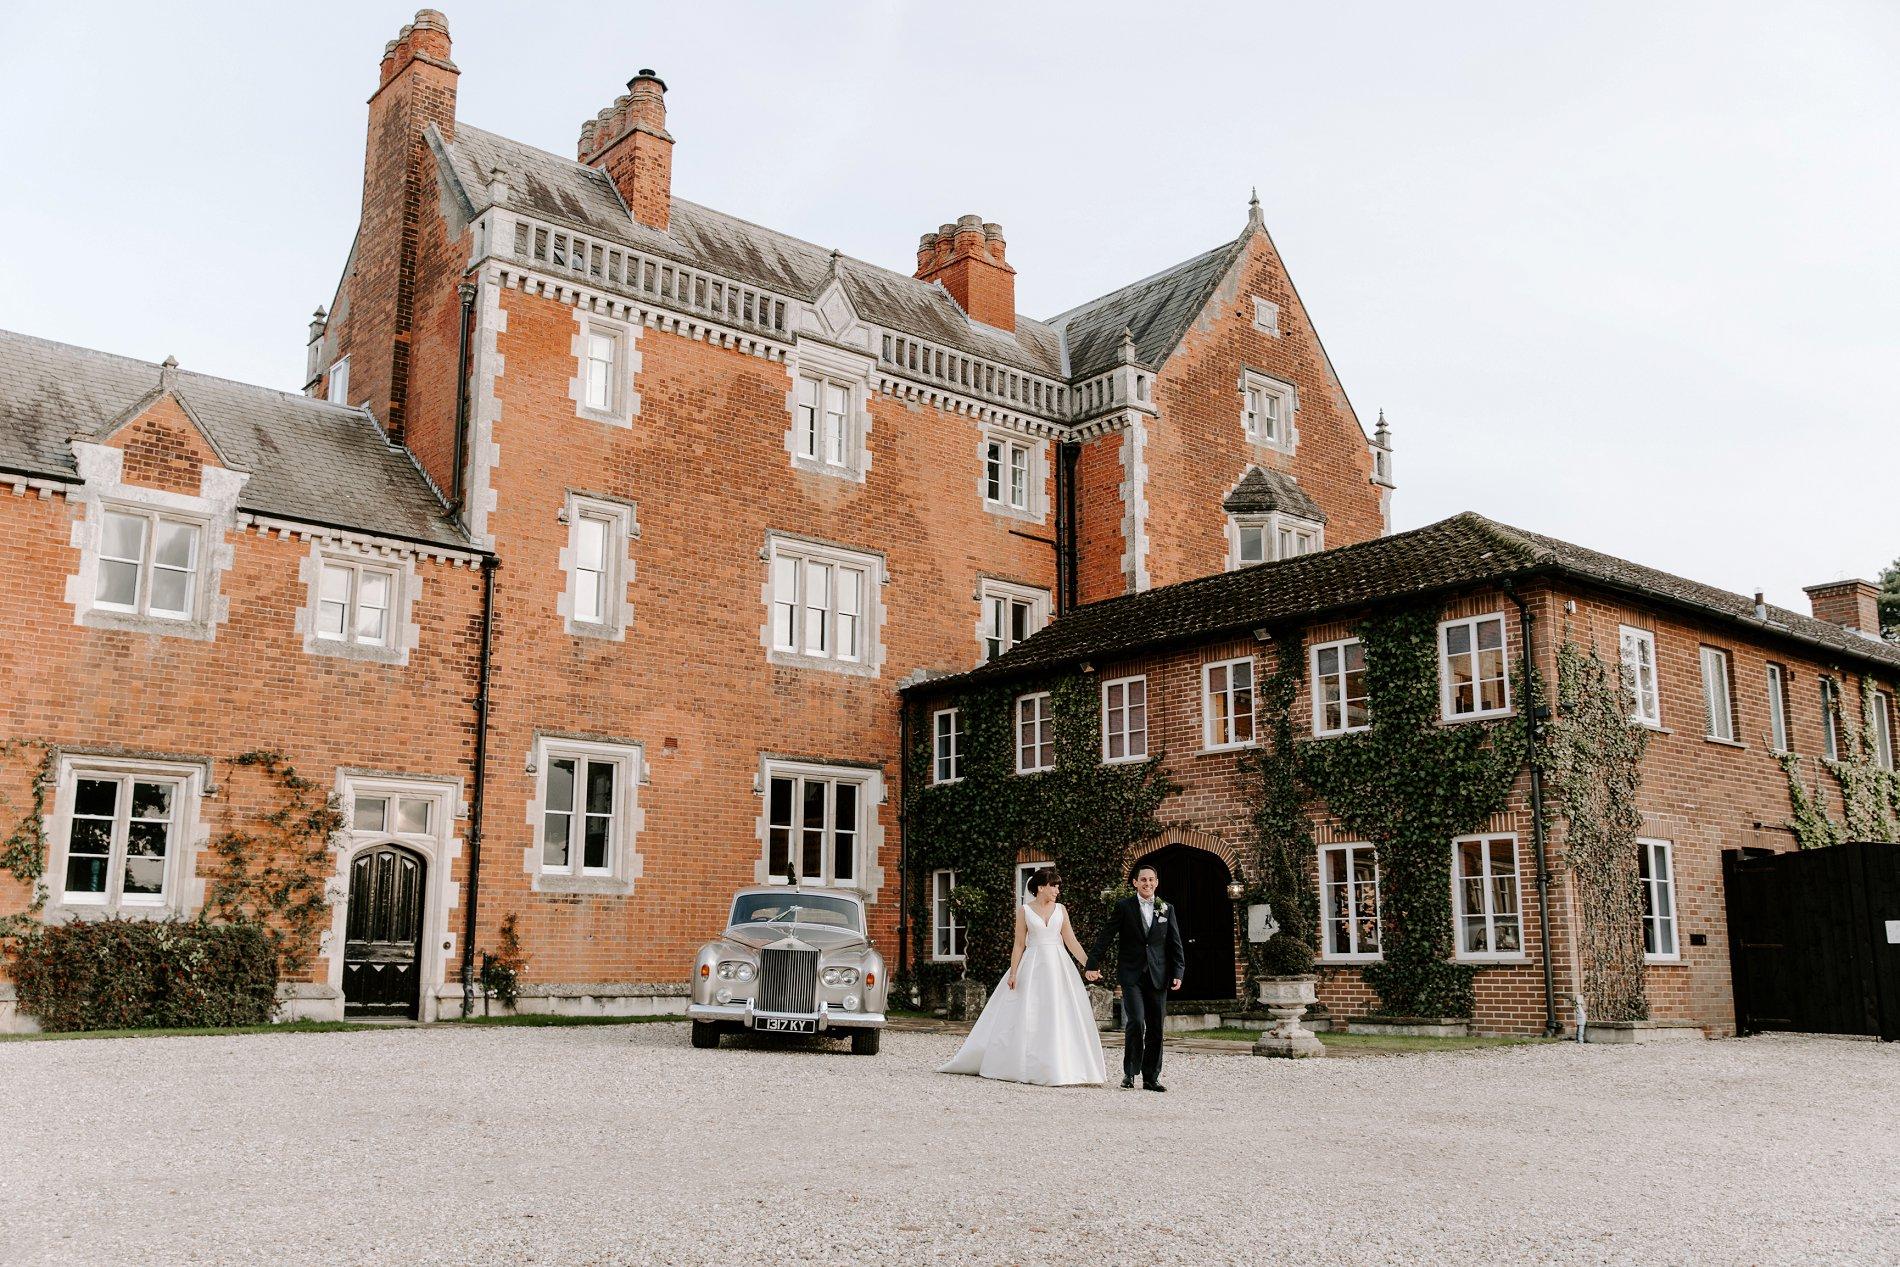 An Elegant White Wedding at Thicket Priory (c) Carla Whittingham Photography (76)